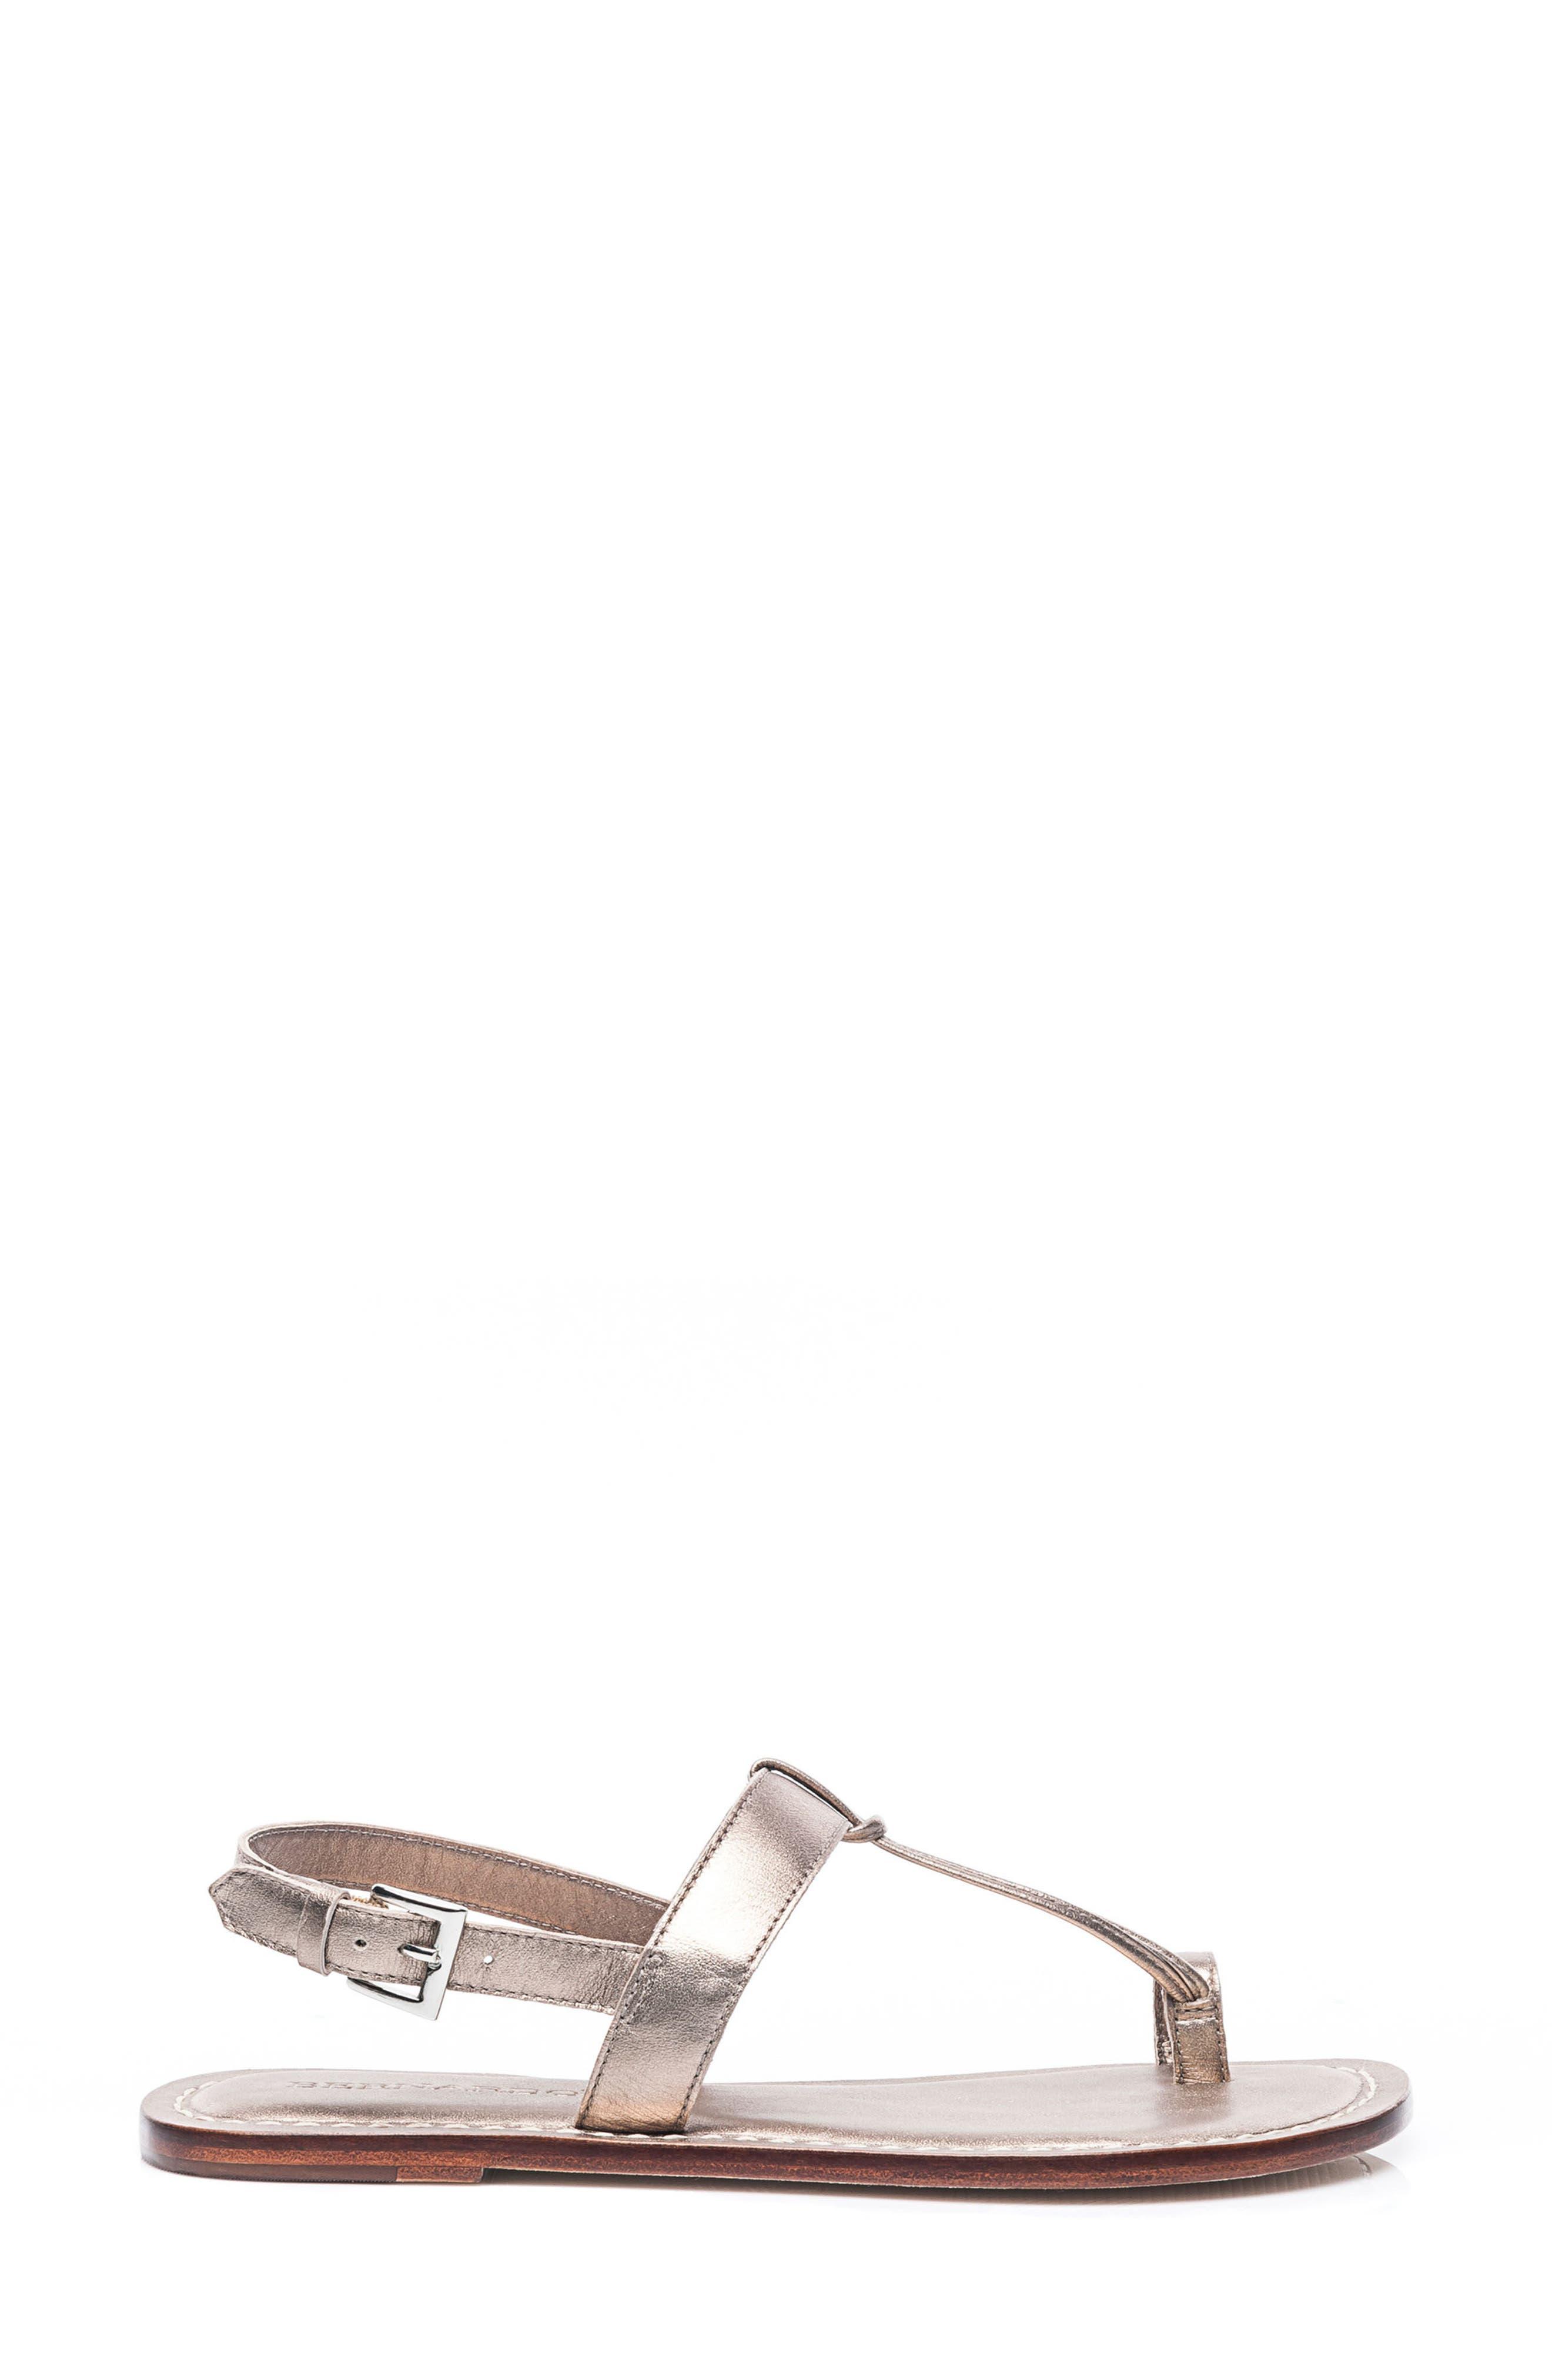 Bernardo Maverick Leather Sandal,                             Alternate thumbnail 3, color,                             Platinum Leather